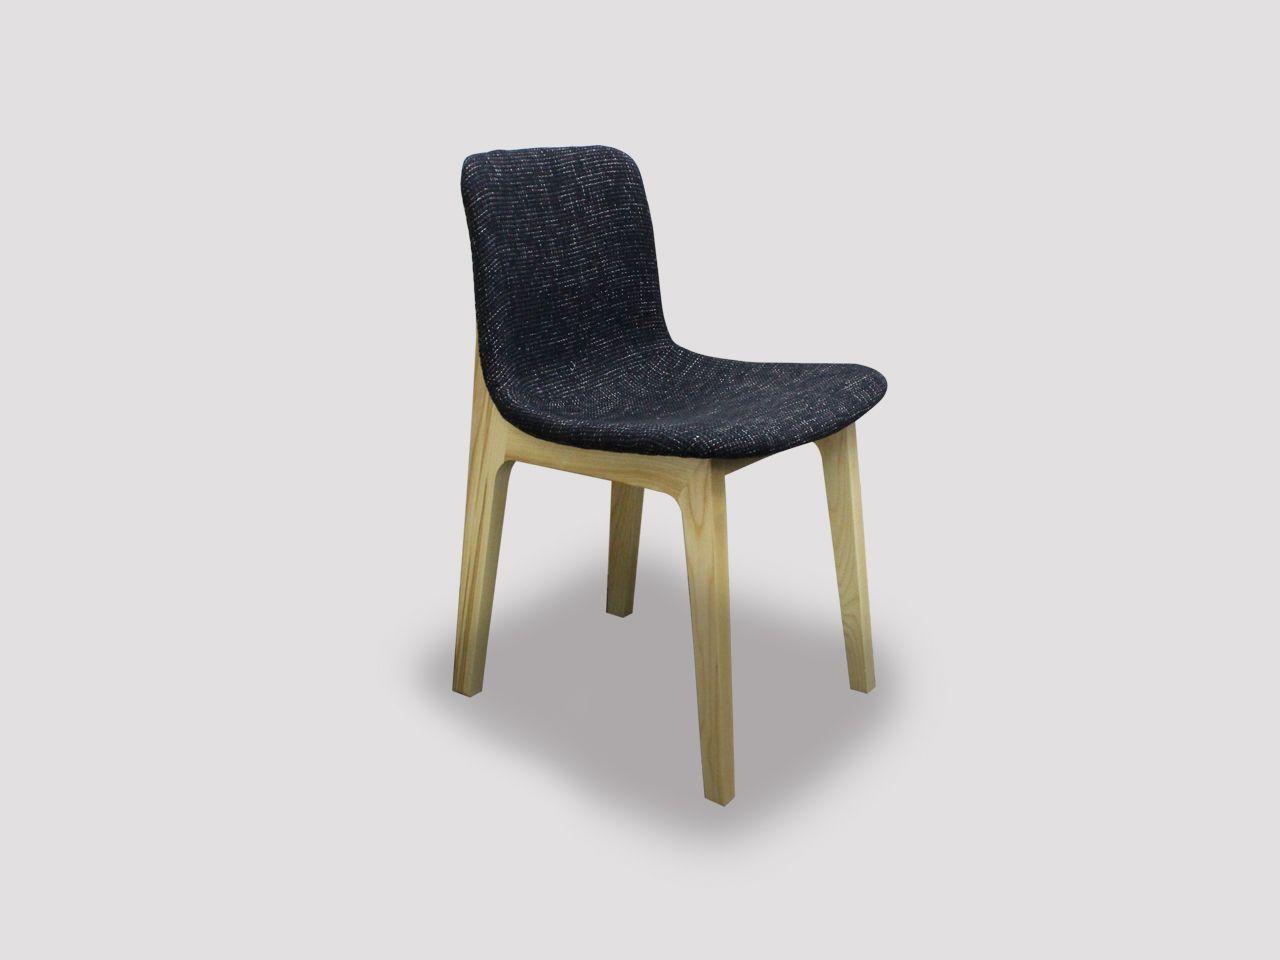 Pino By Comfort Design Www Comfortfurniture Com Sg Upholstered